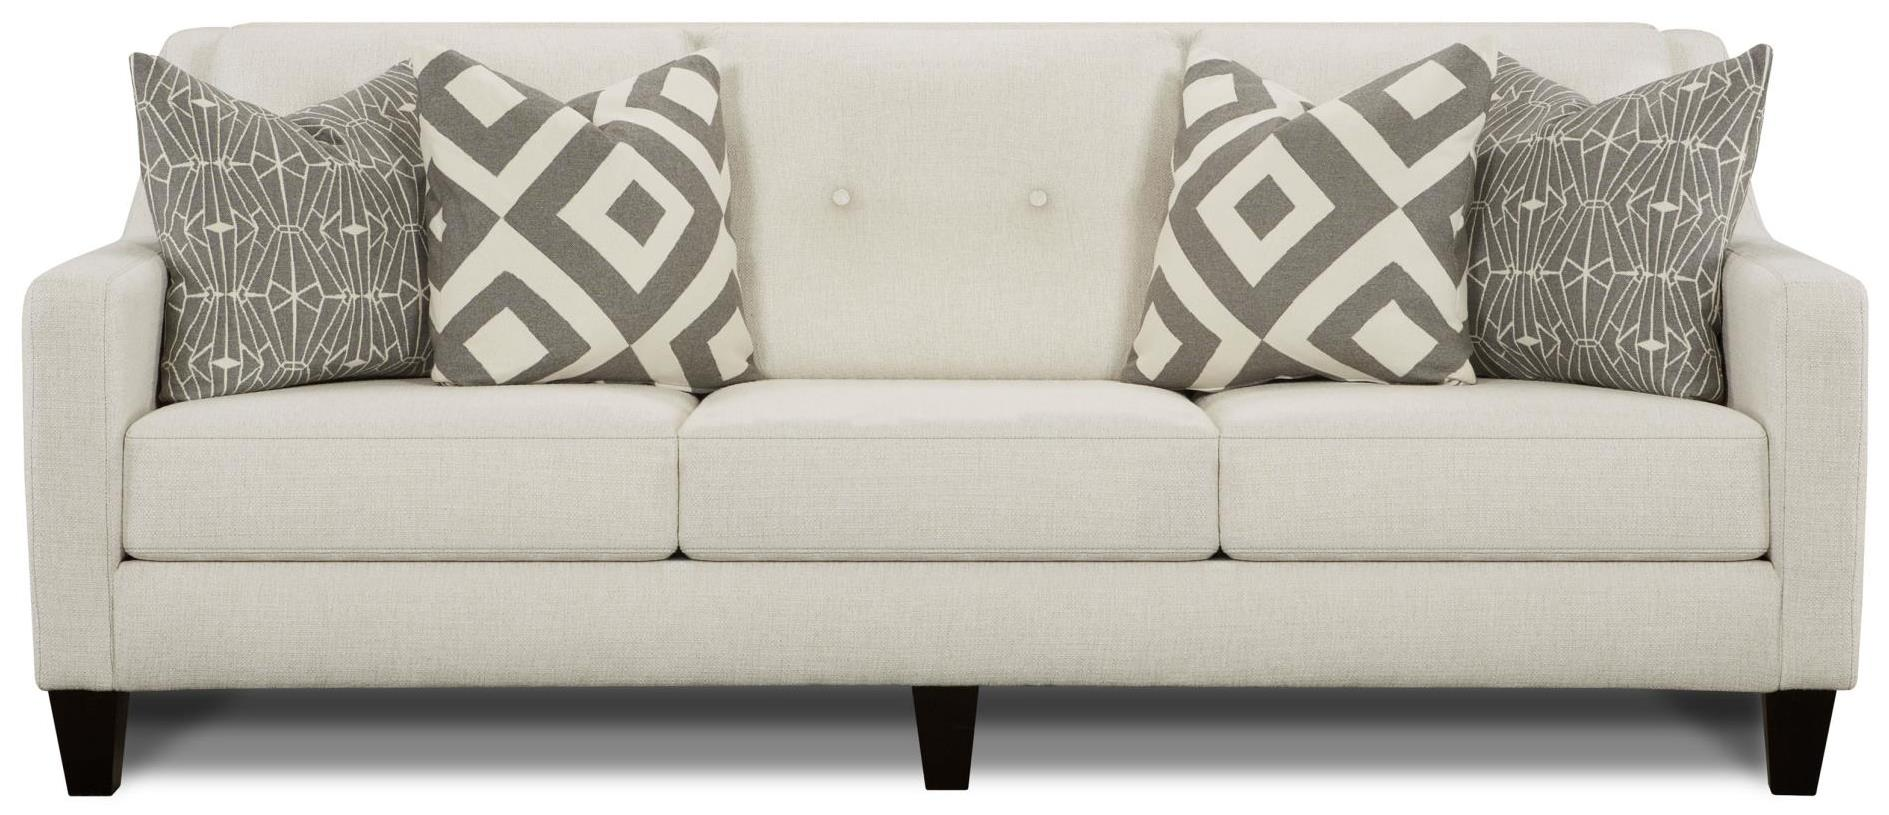 Carla Sofa by Fusion Furniture at Crowley Furniture & Mattress